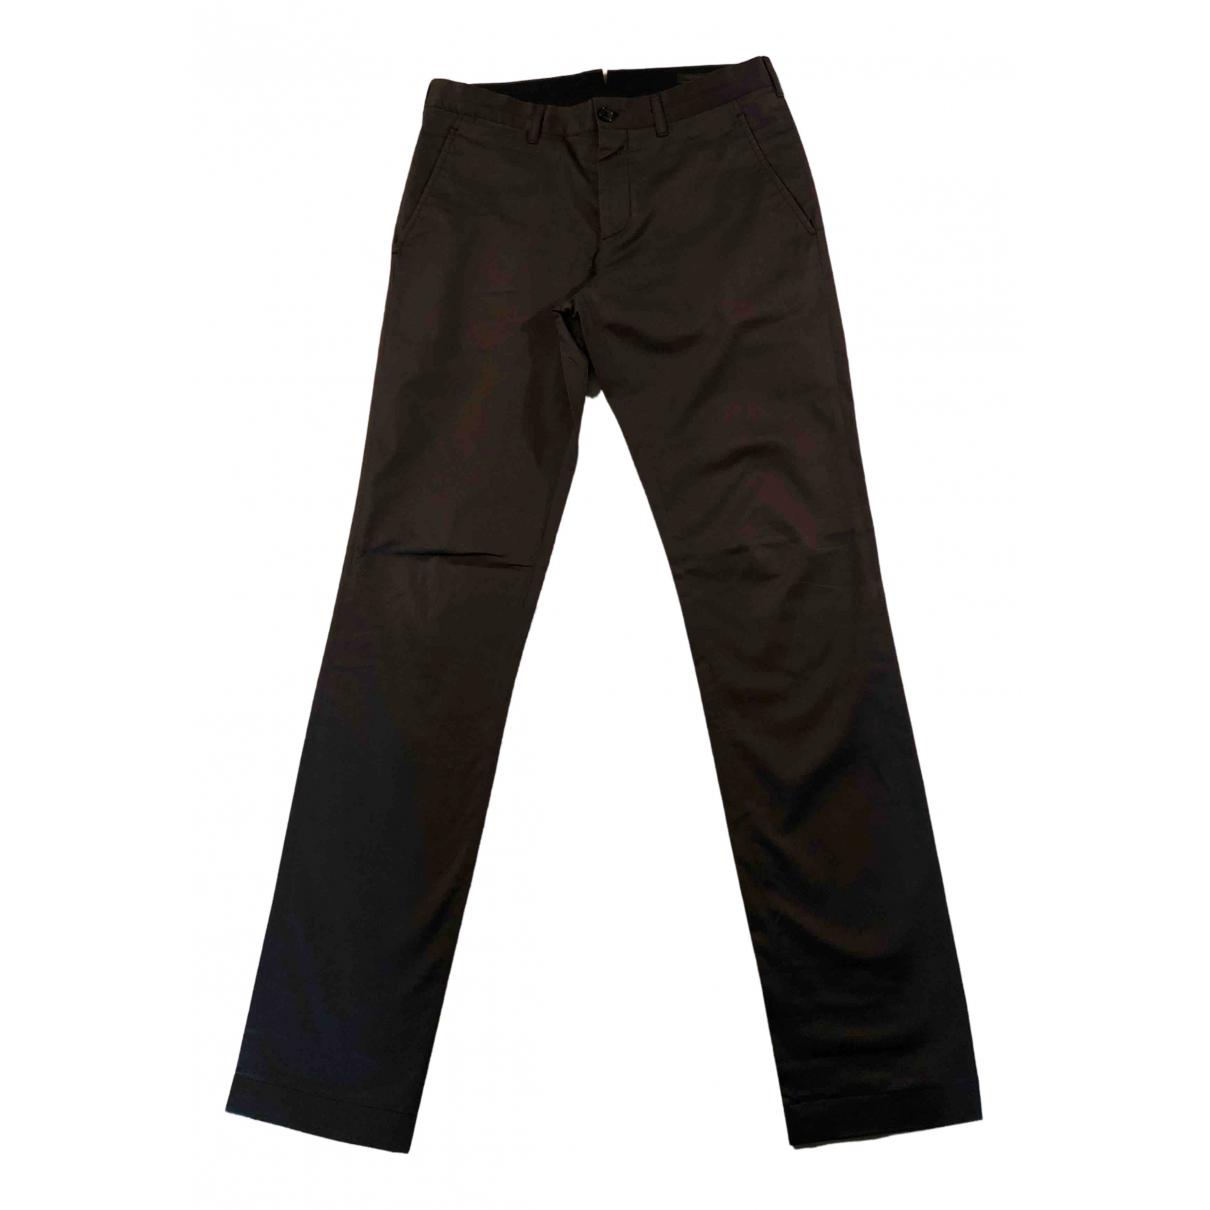 Prada N Grey Cotton Trousers for Men 46 IT